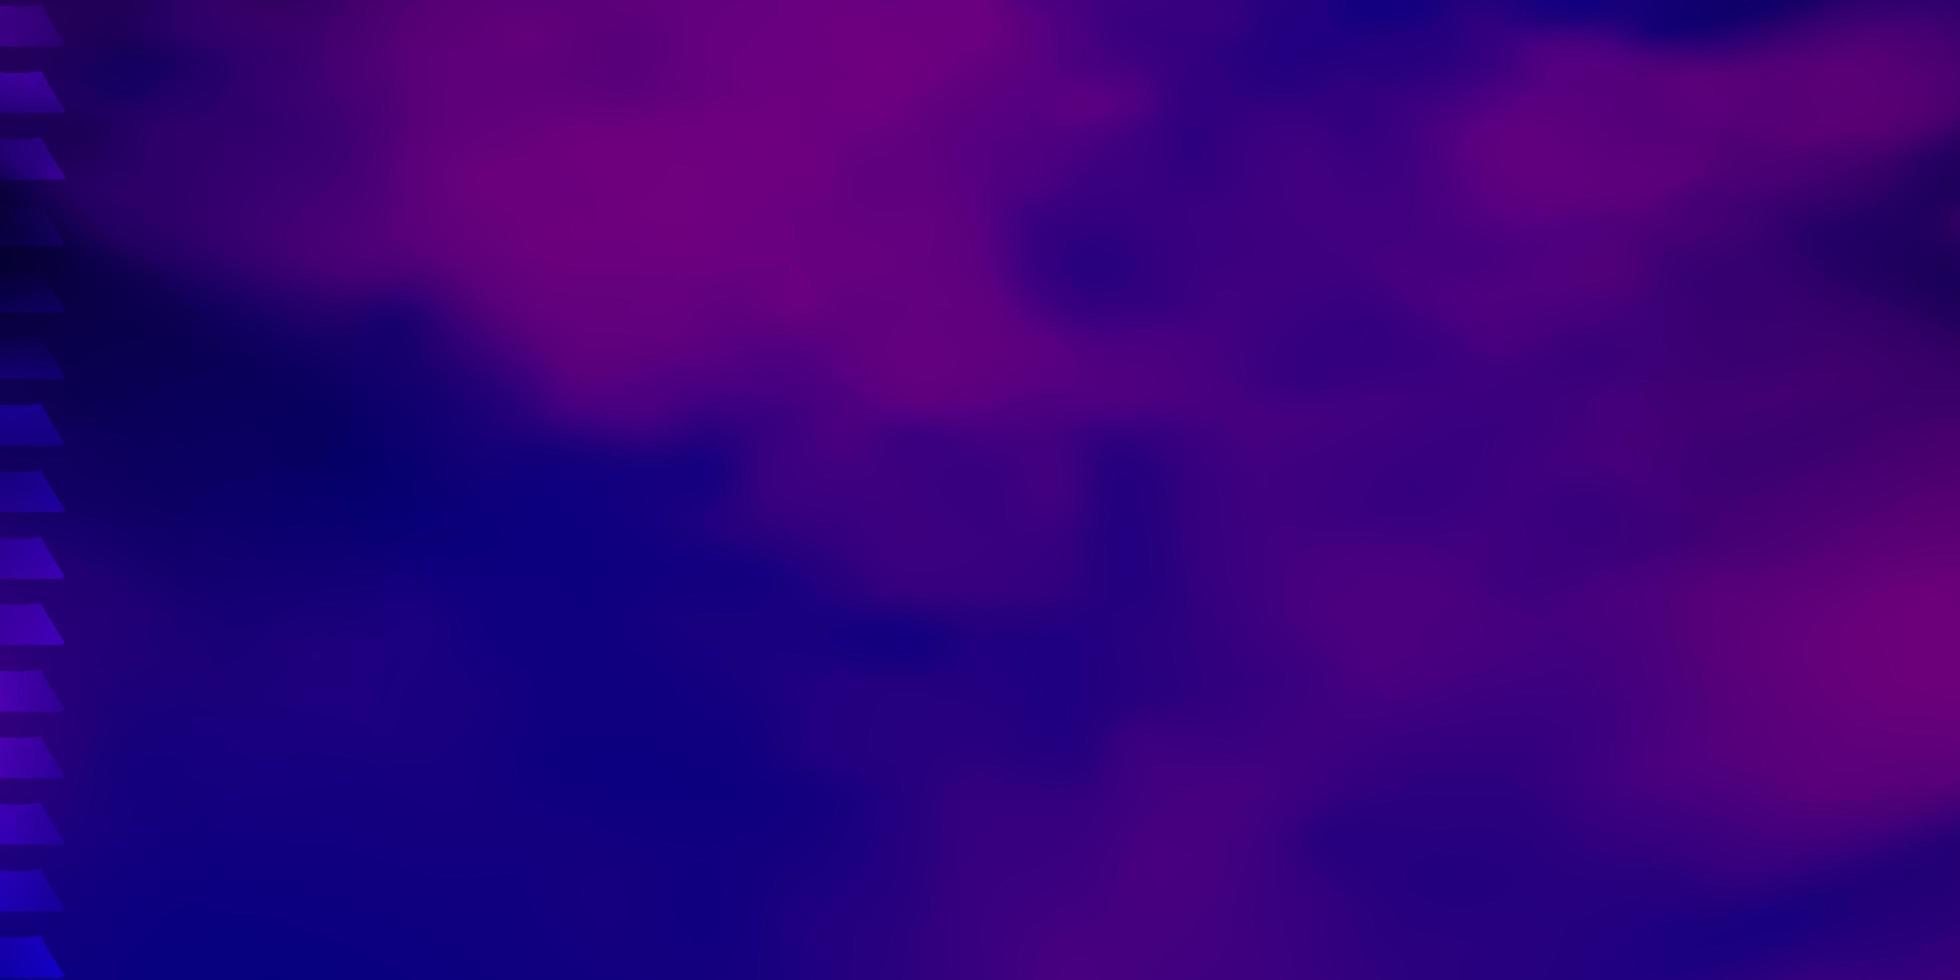 fundo vector rosa claro roxo com retângulos.